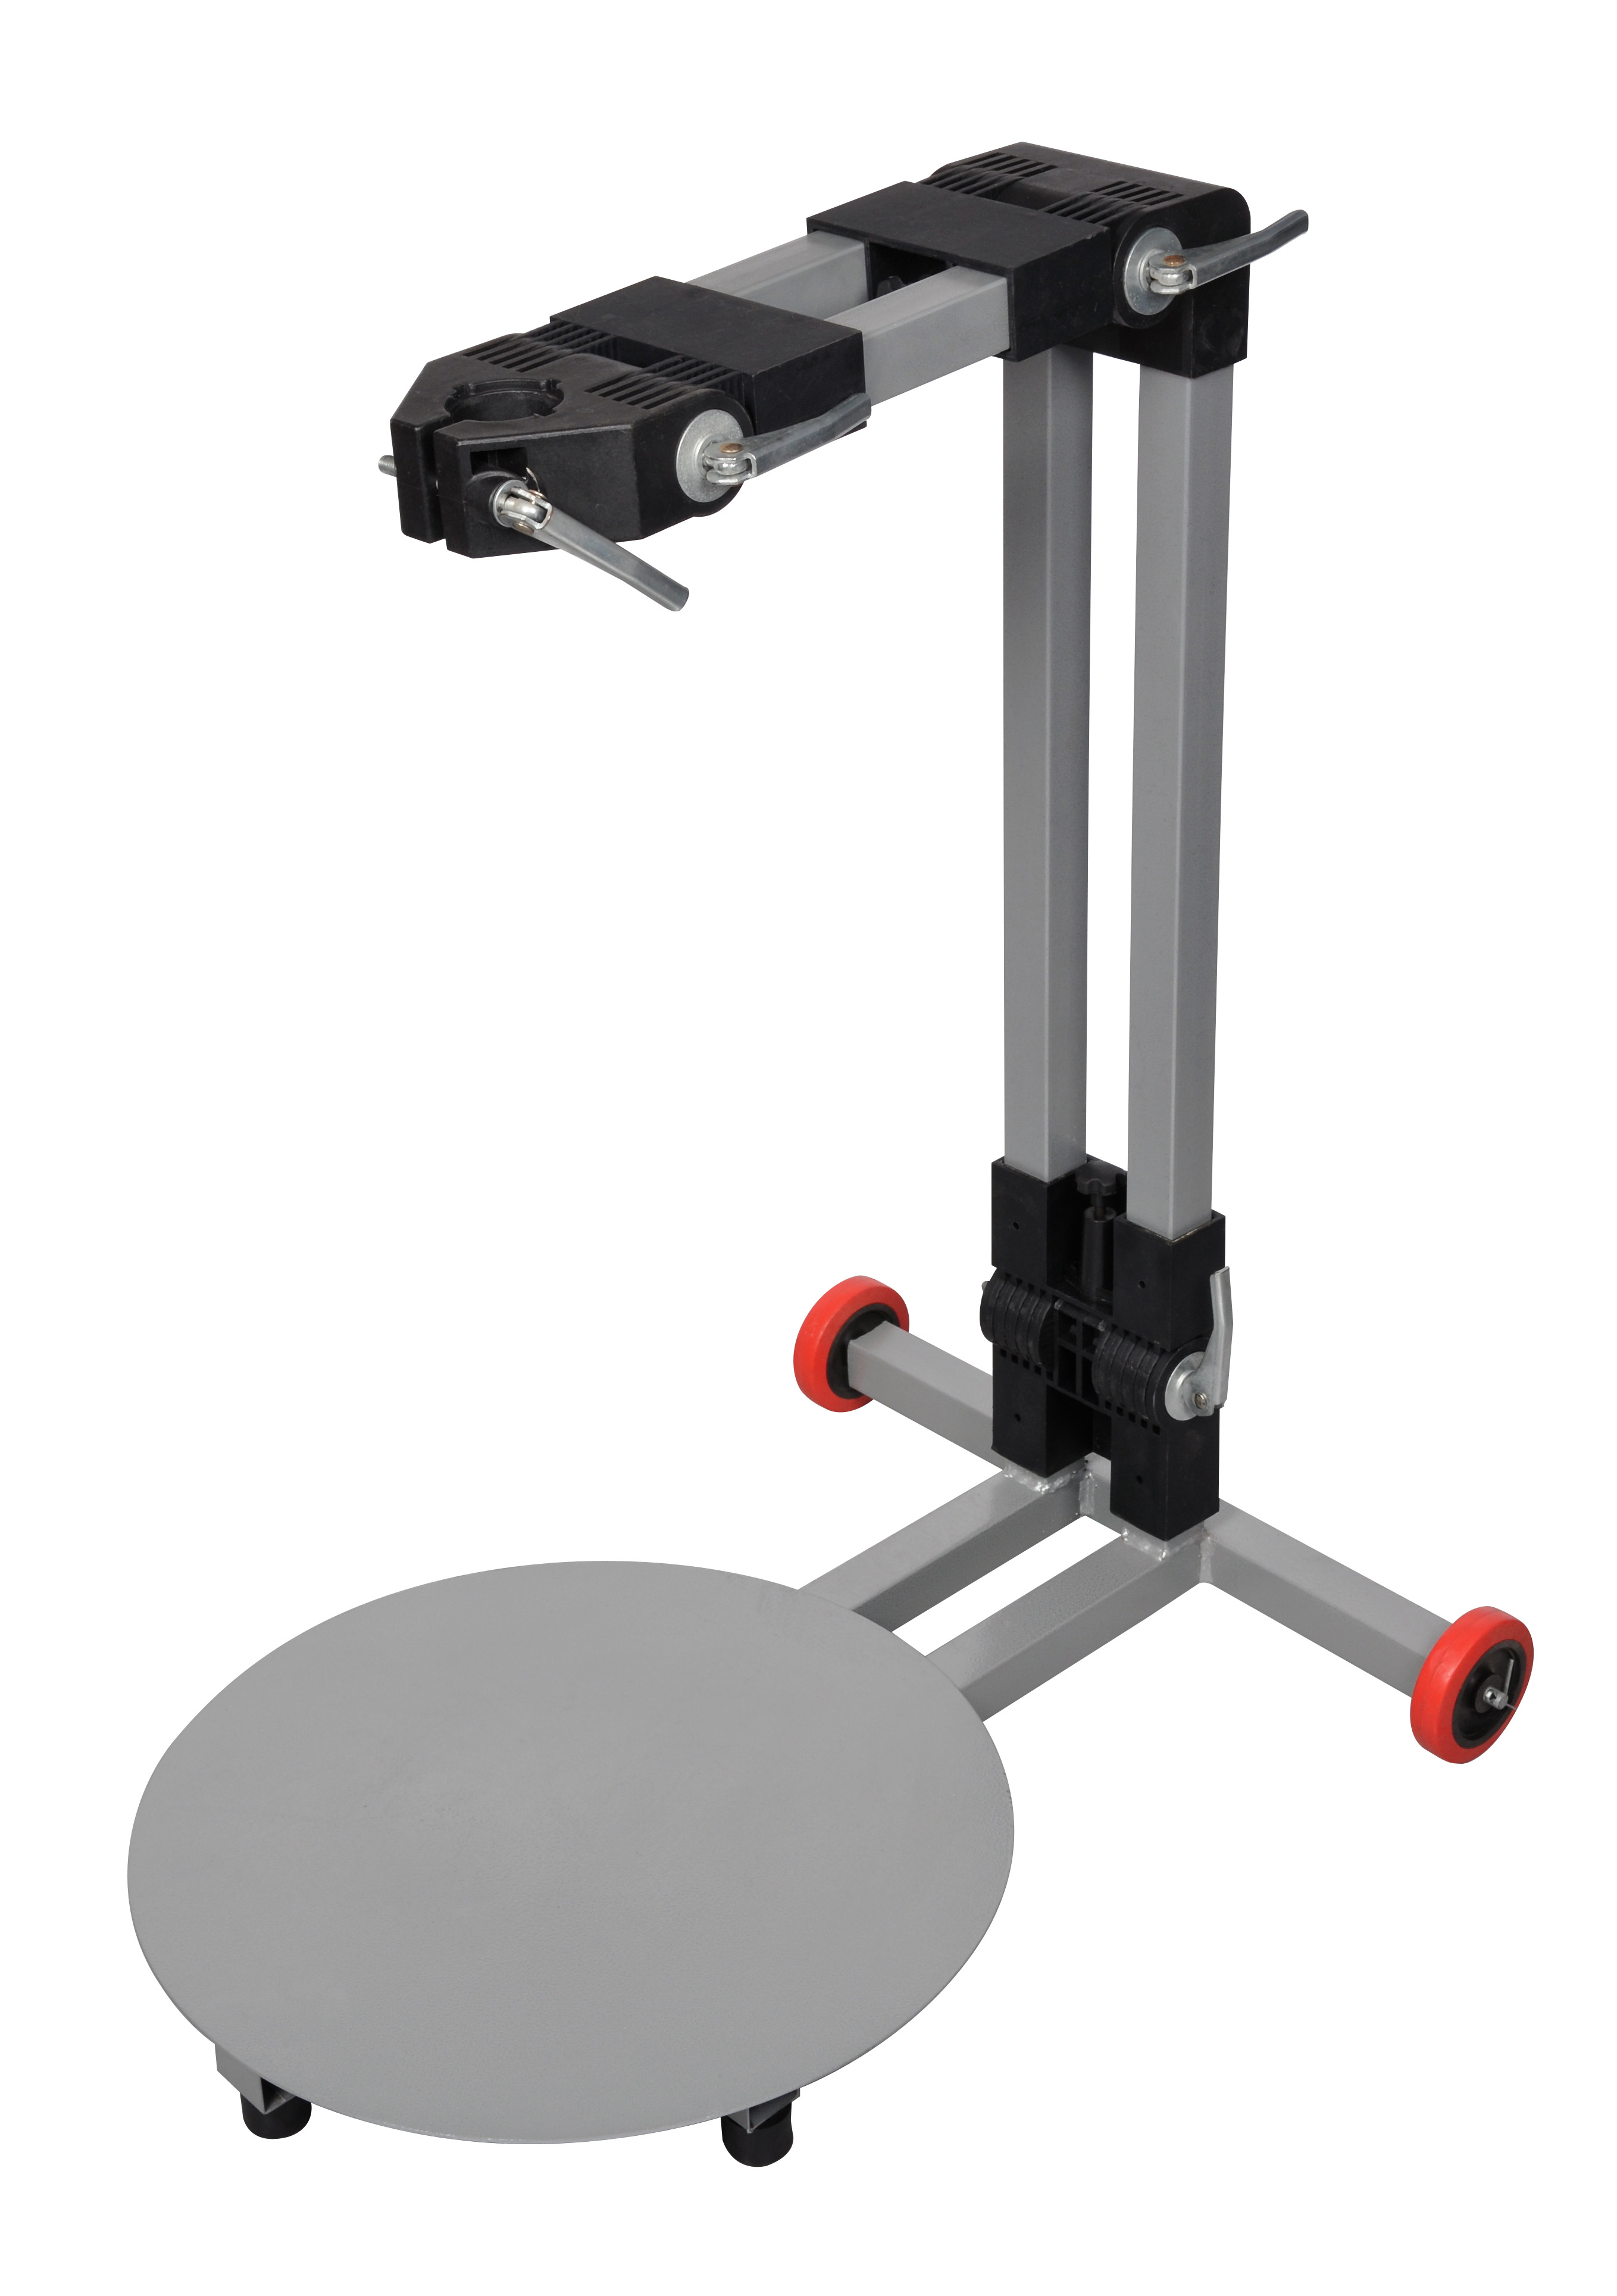 Mixer Stand - Vitrex